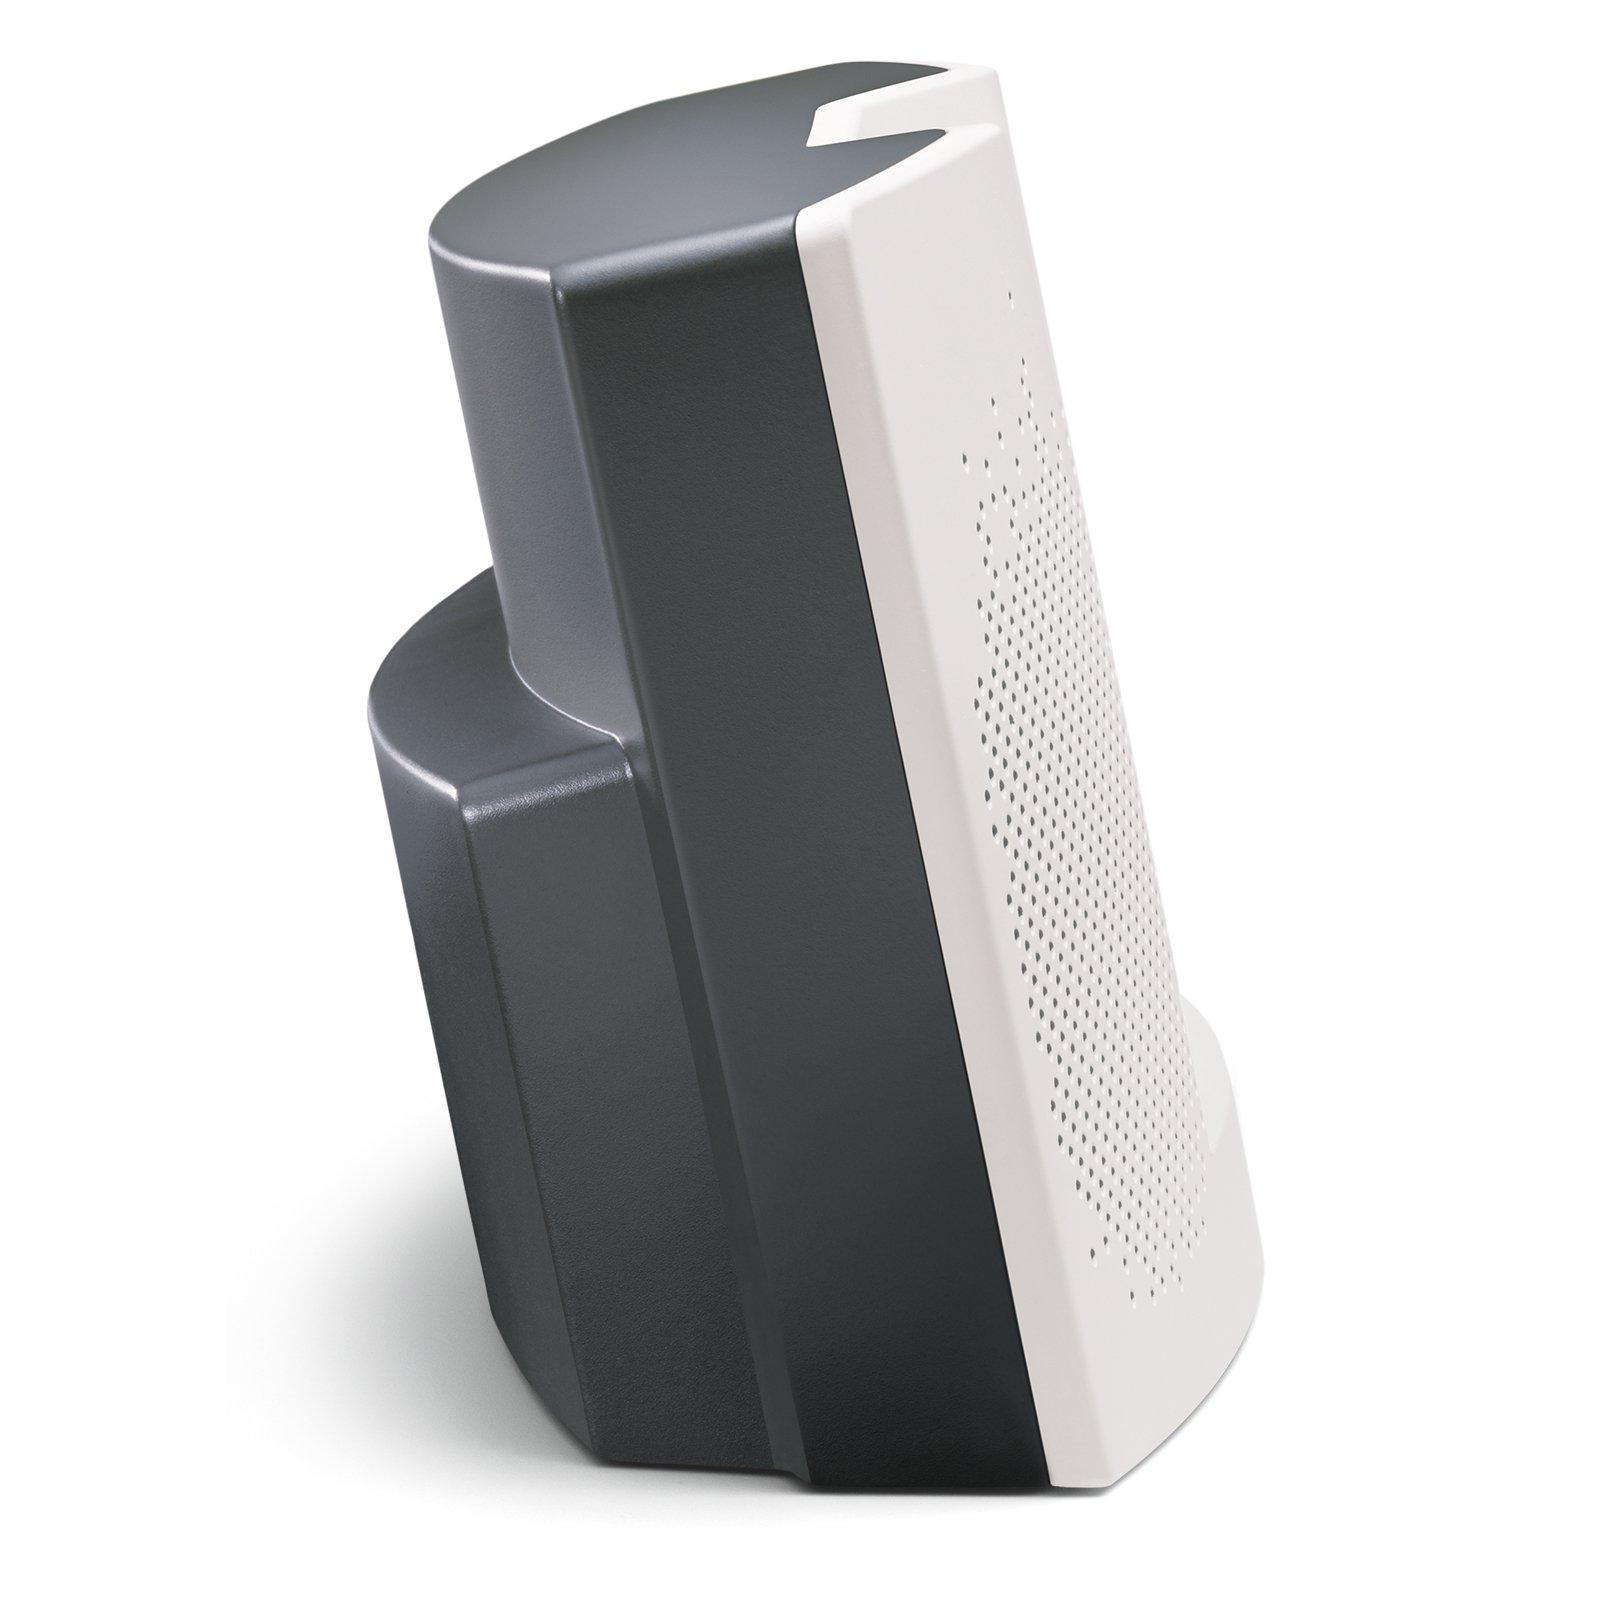 bose sounddock xt speaker white dark gray amazon. Black Bedroom Furniture Sets. Home Design Ideas